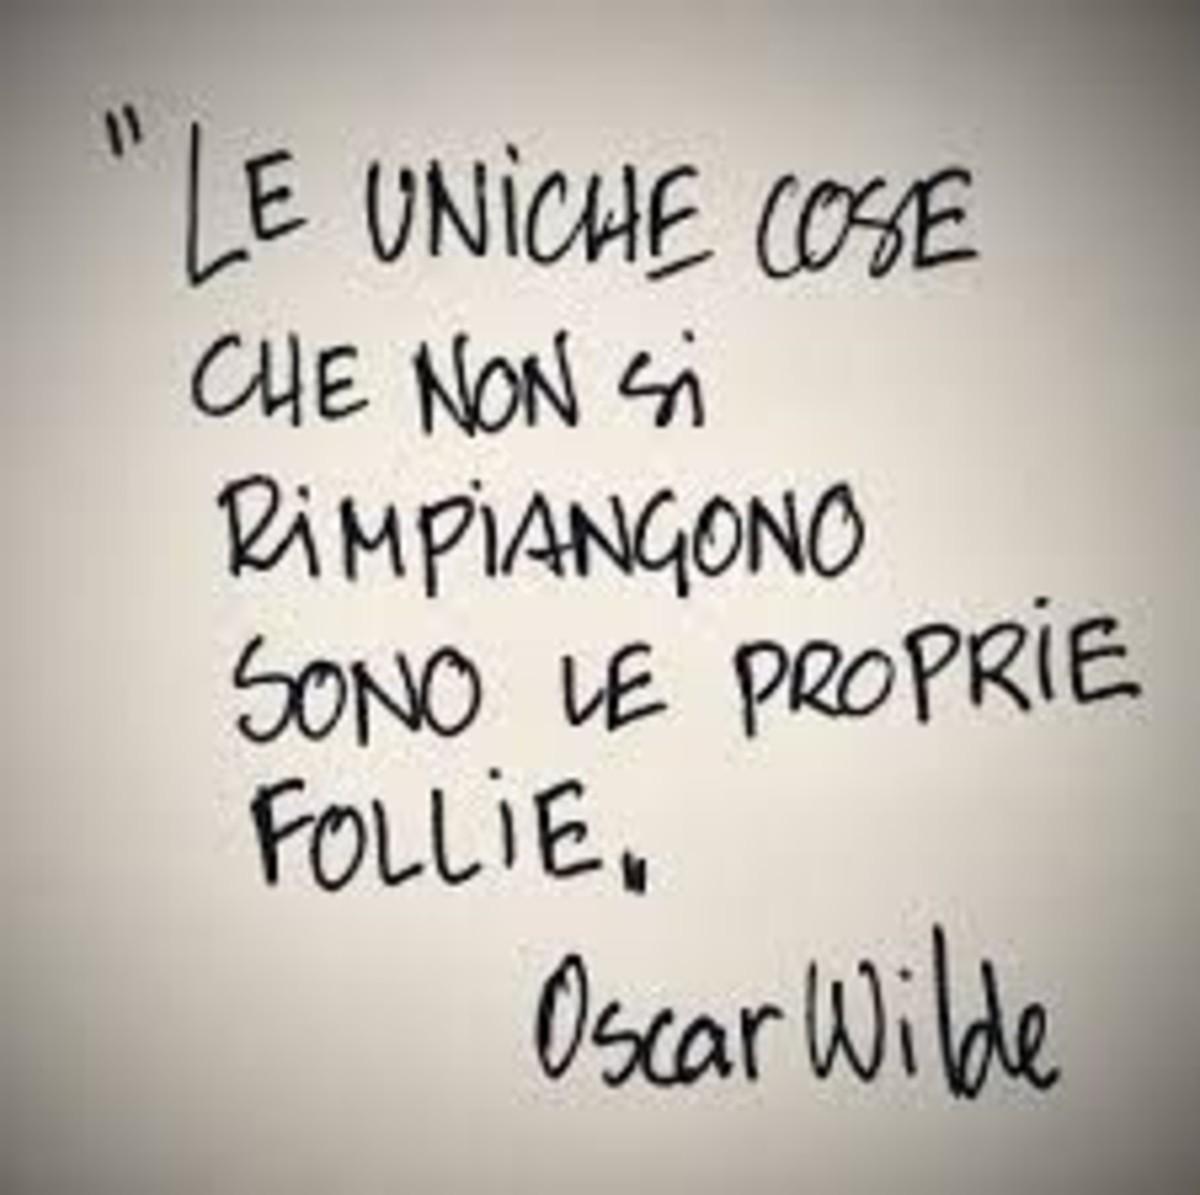 Frasi Di Natale Oscar Wilde.Frasi Di Oscar Wilde 2 Buongiornoate It